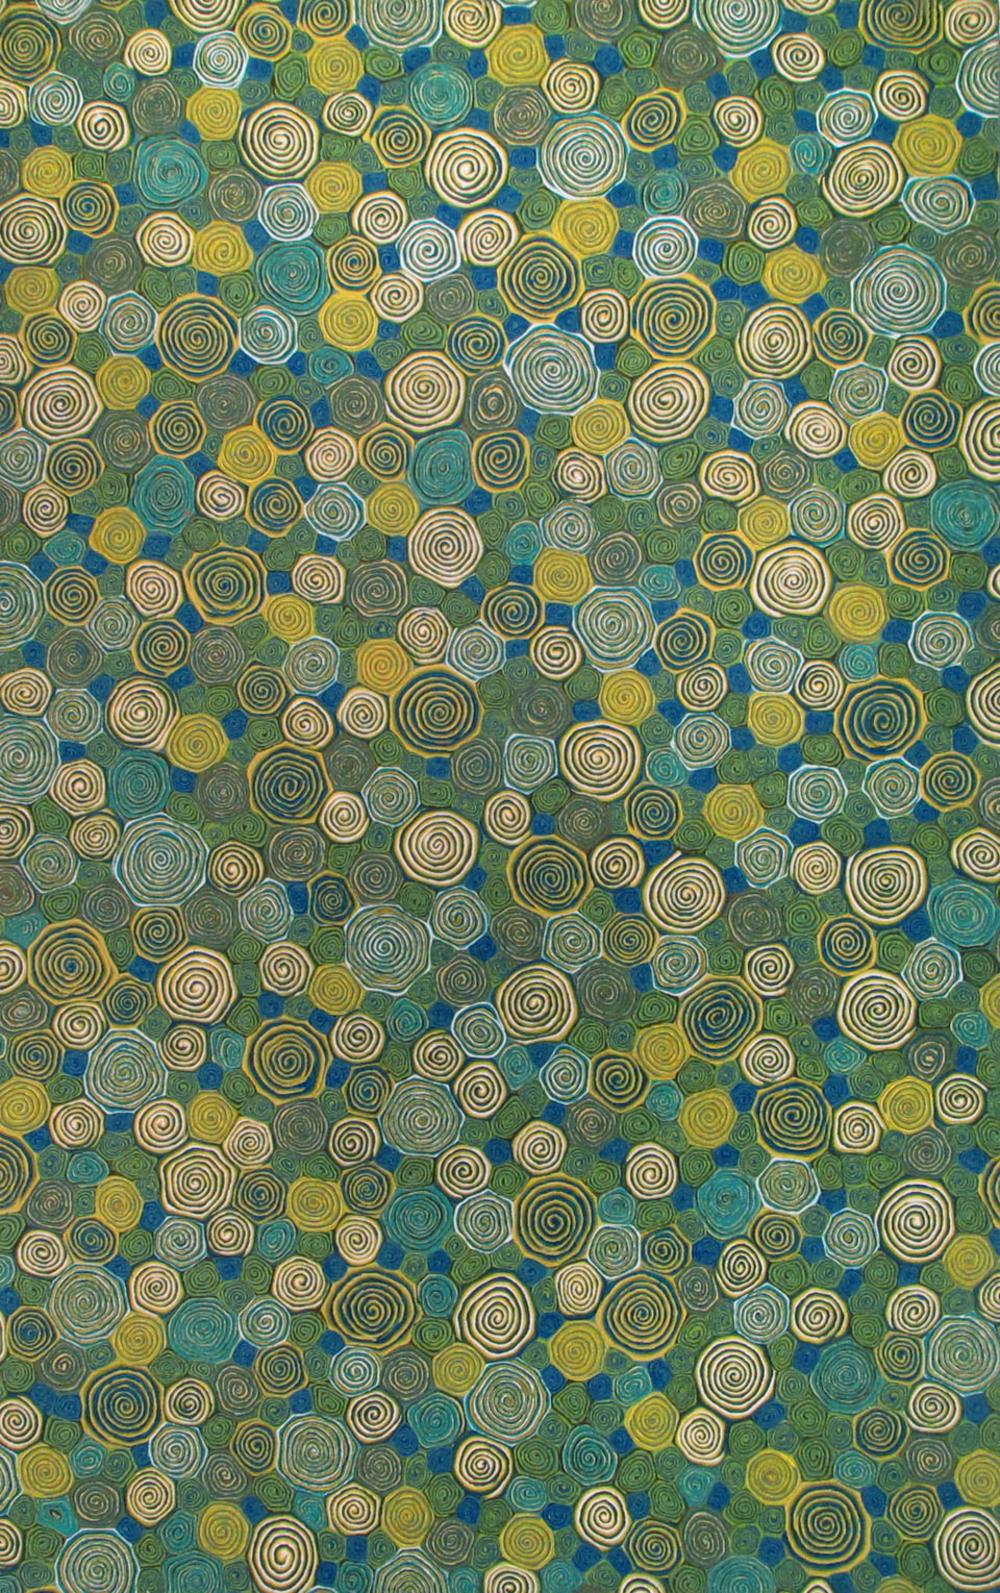 Trans-Ocean Import - Visions III Giant Swirls Marina Rug, 5'x8'